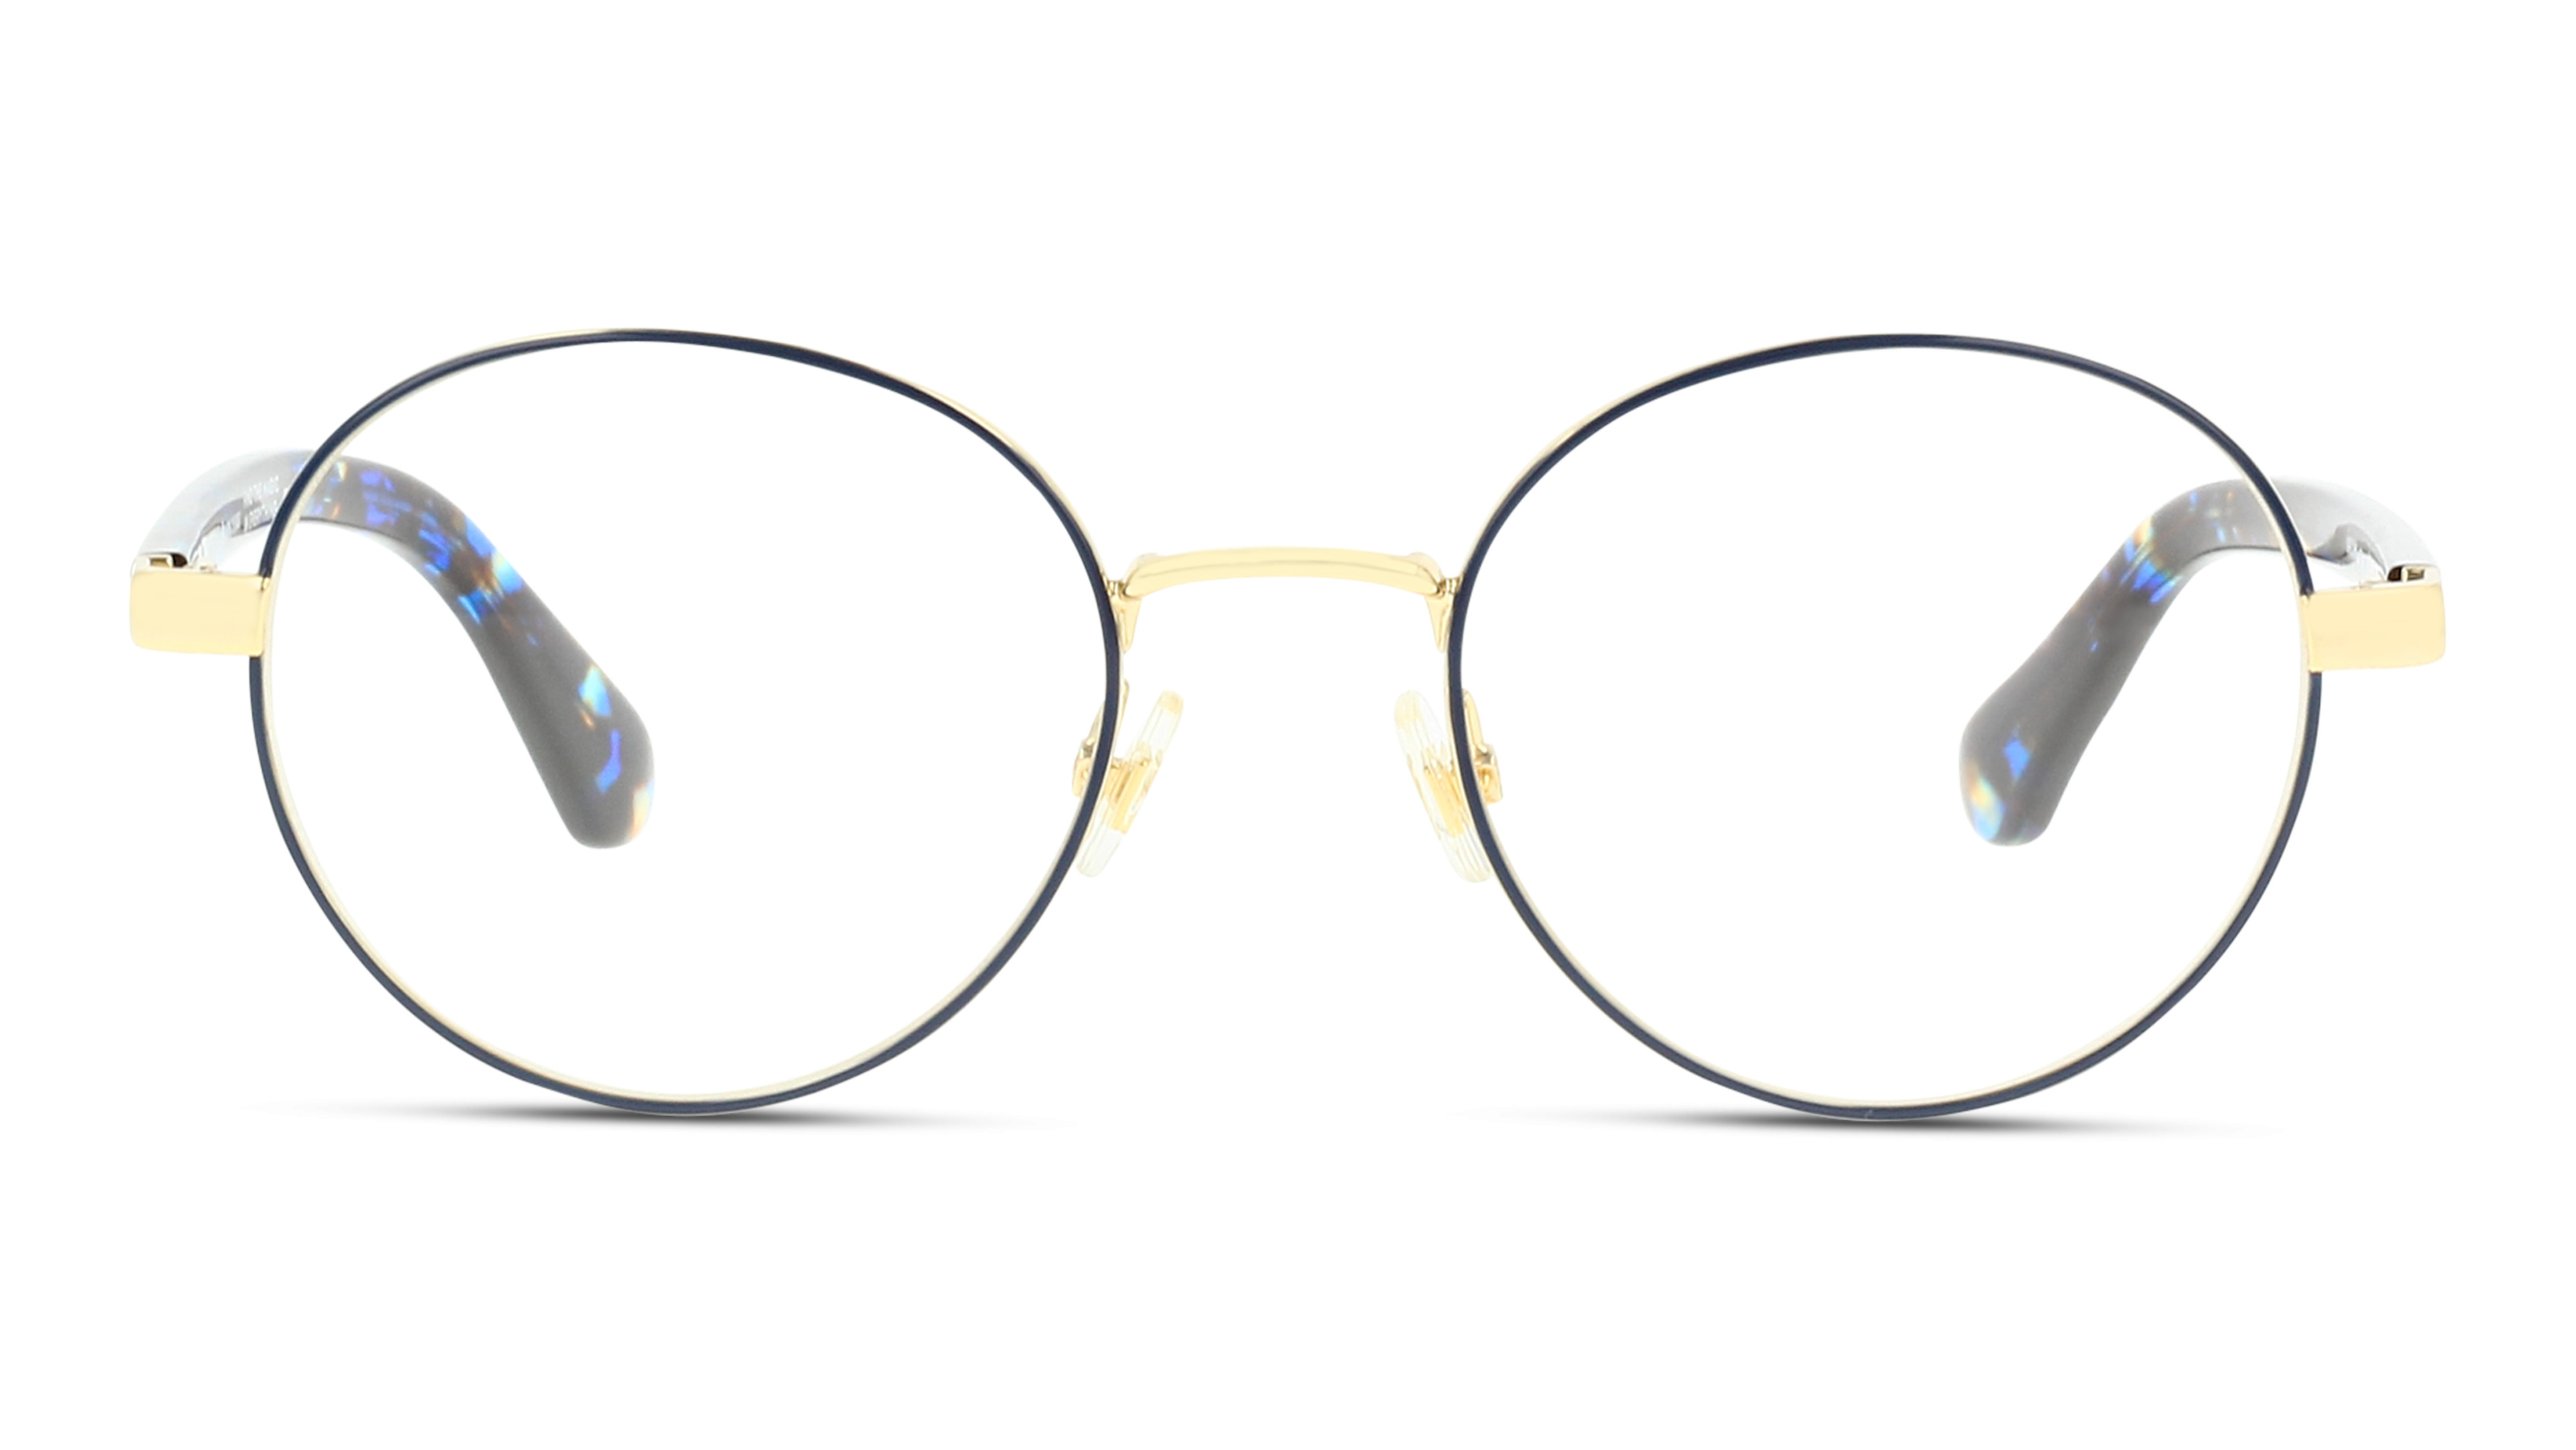 762753994363-front-01-kate-spade-marciann-Eyewear-pair